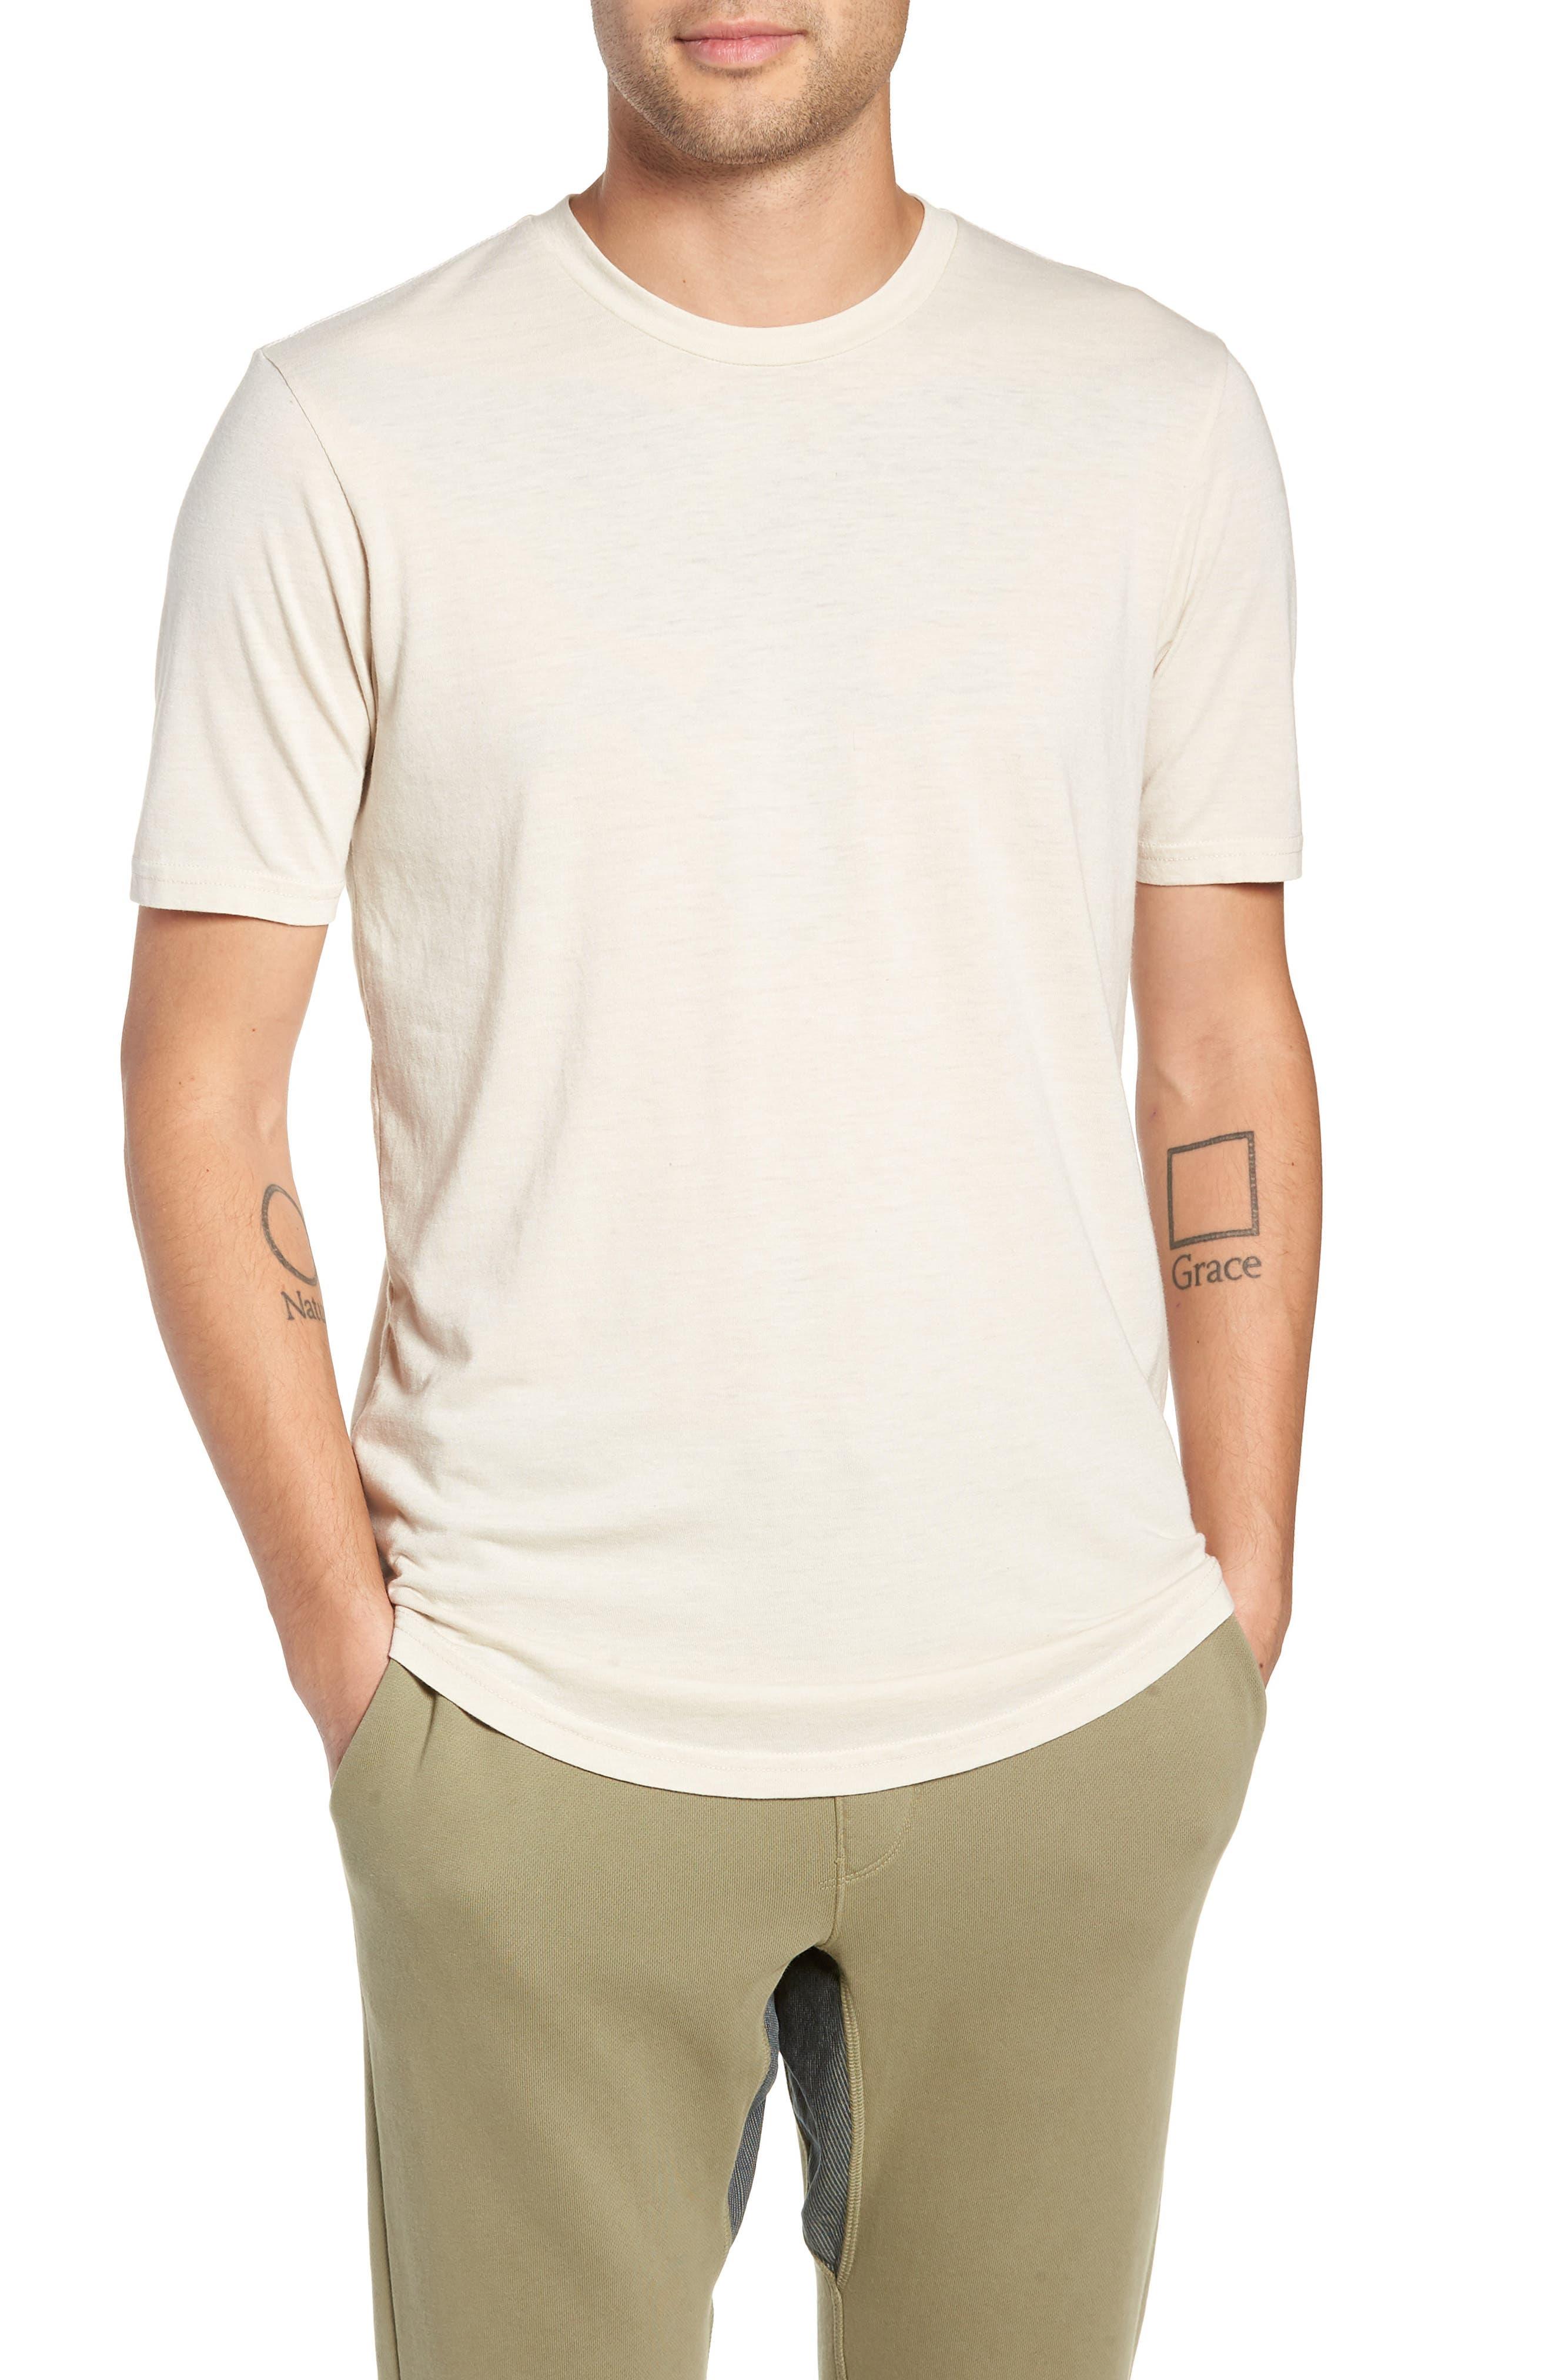 GOODLIFE Scallop Triblend Crewneck T-Shirt, Main, color, OYSTER